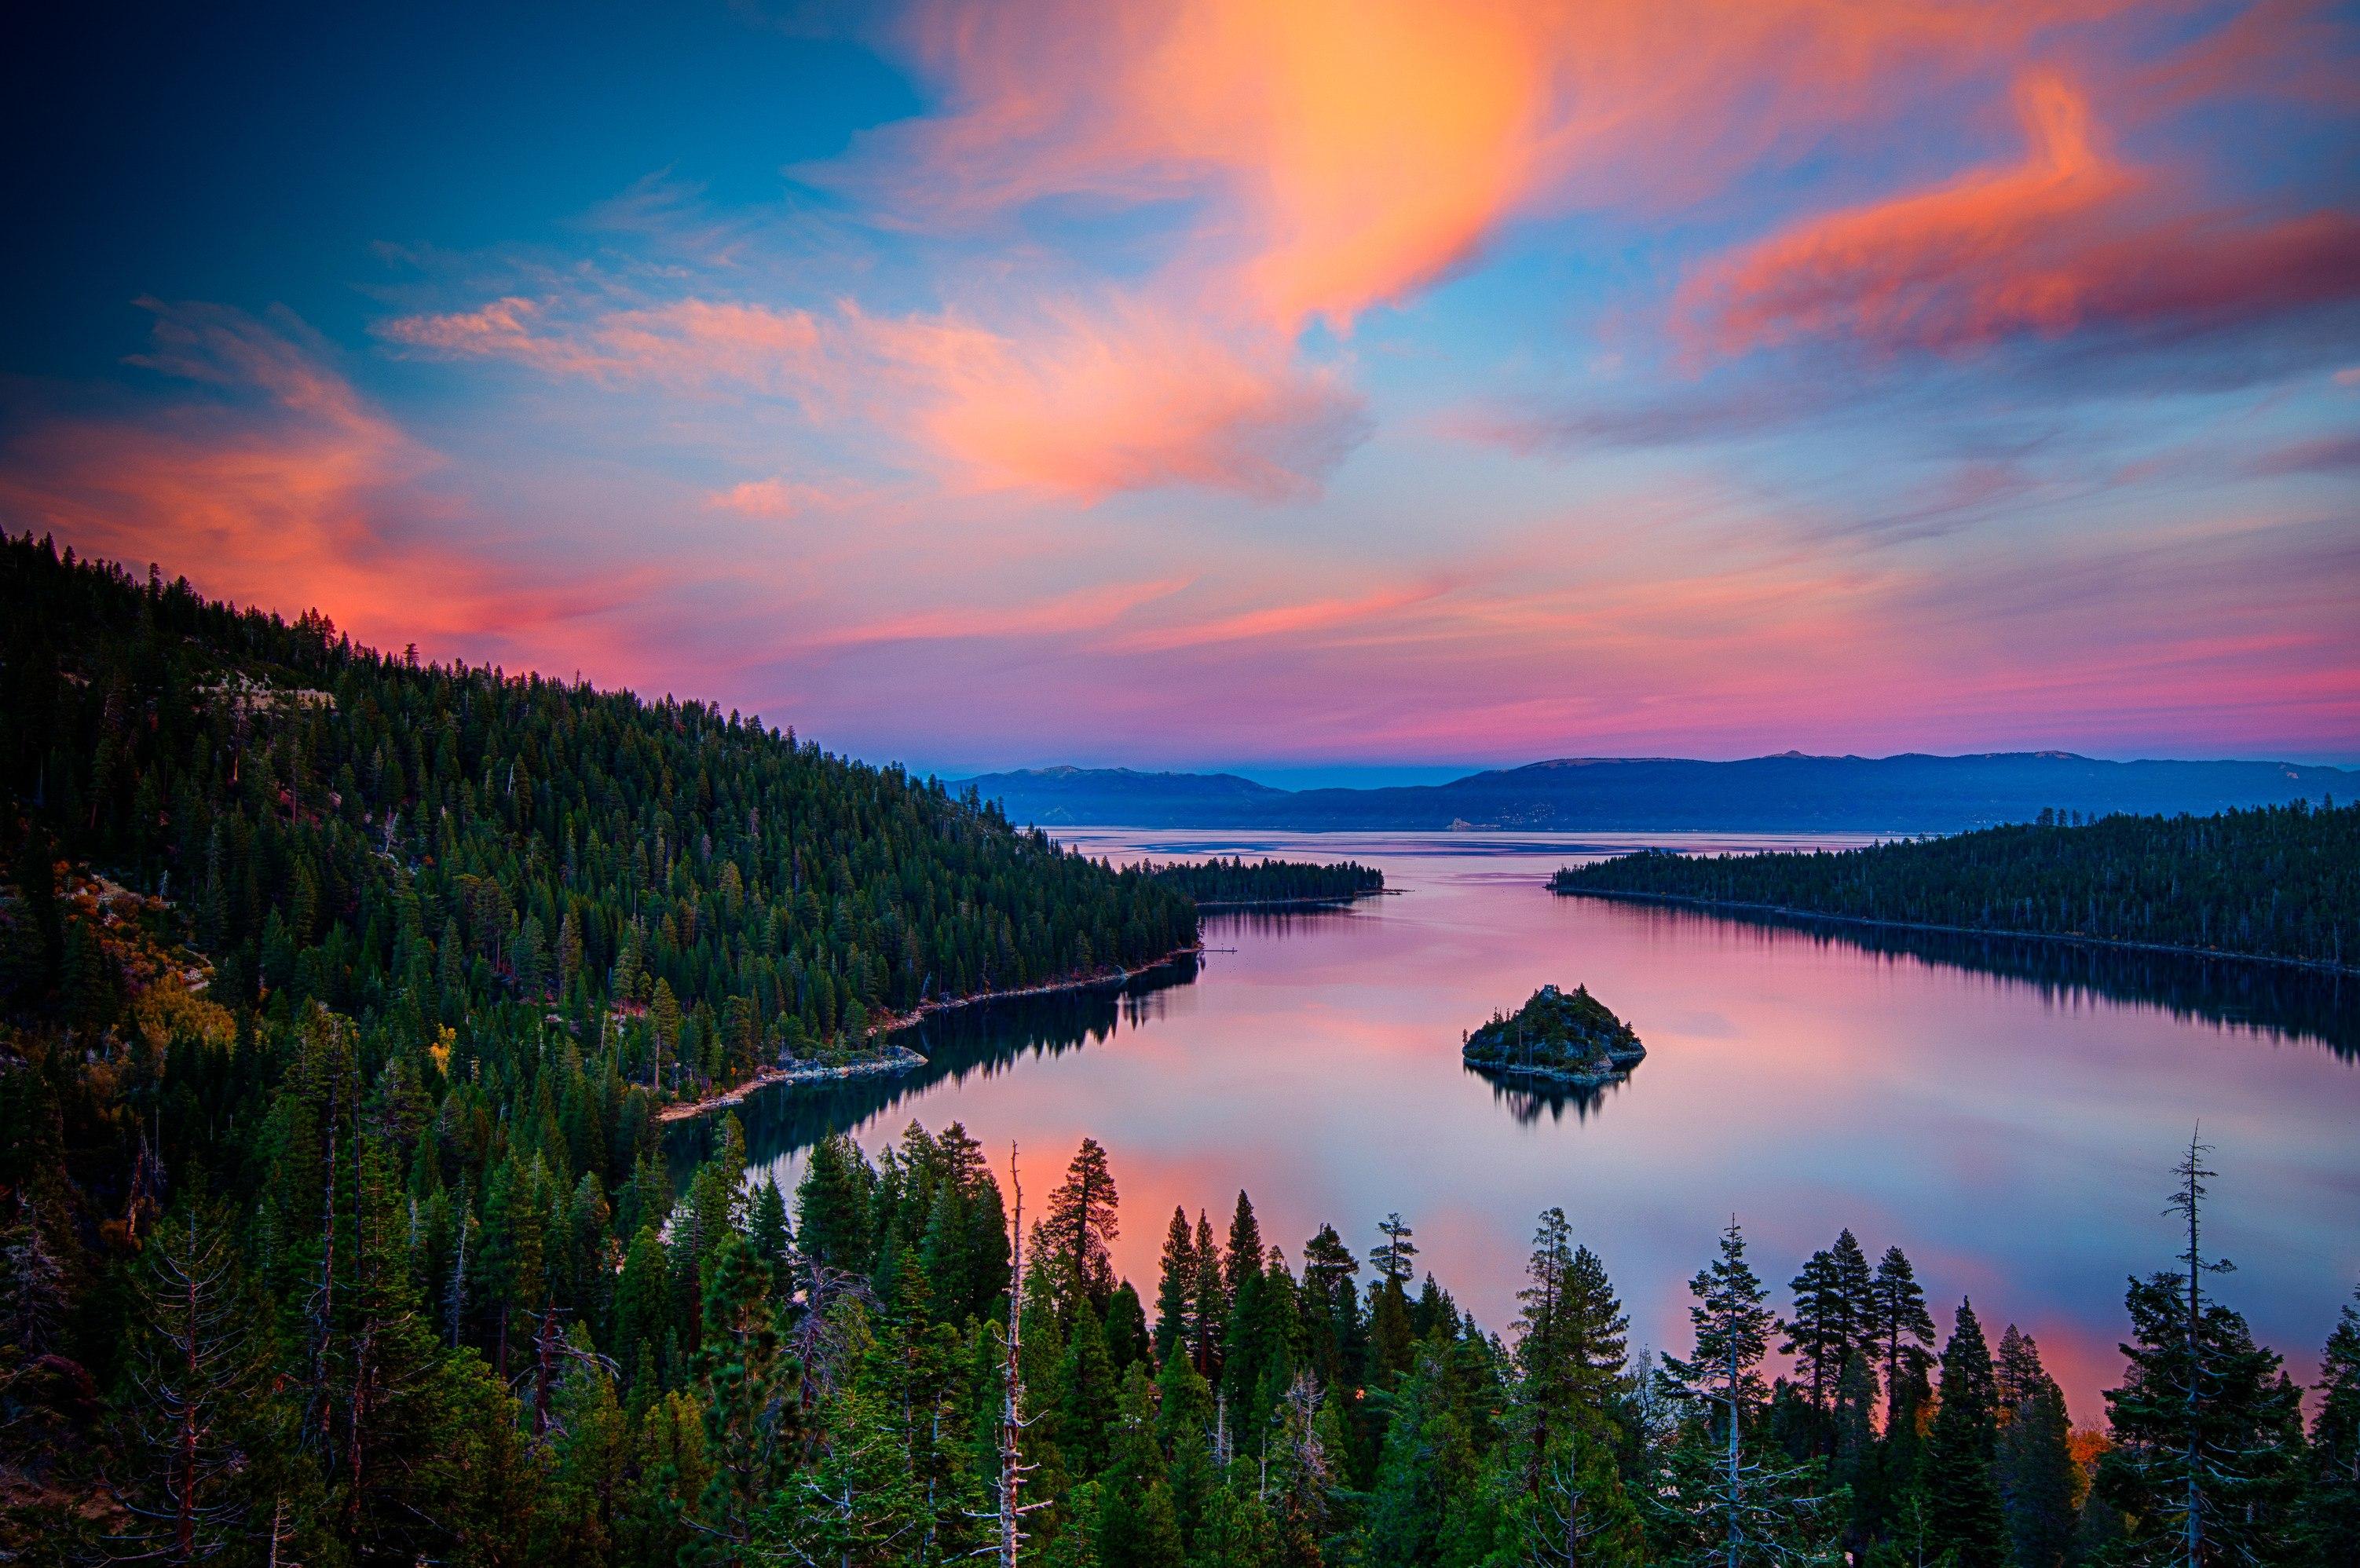 26 Landscape HD Emerald Bay Lake Tahoe Wallpapers 3005x1997